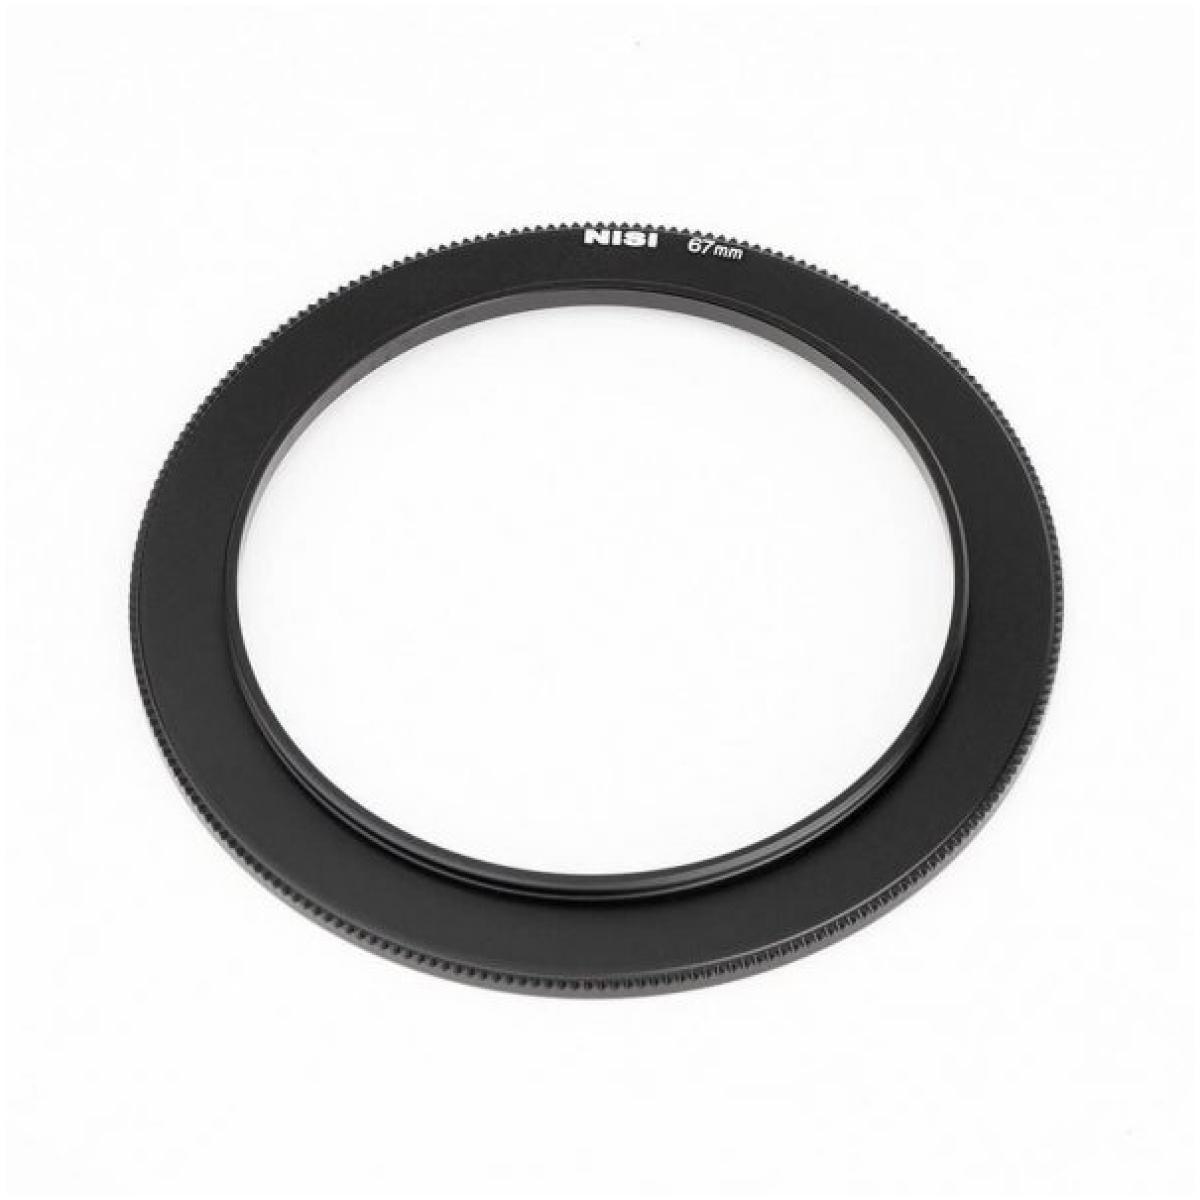 NiSi Adapterring 67 mm für V5 und V5 Pro